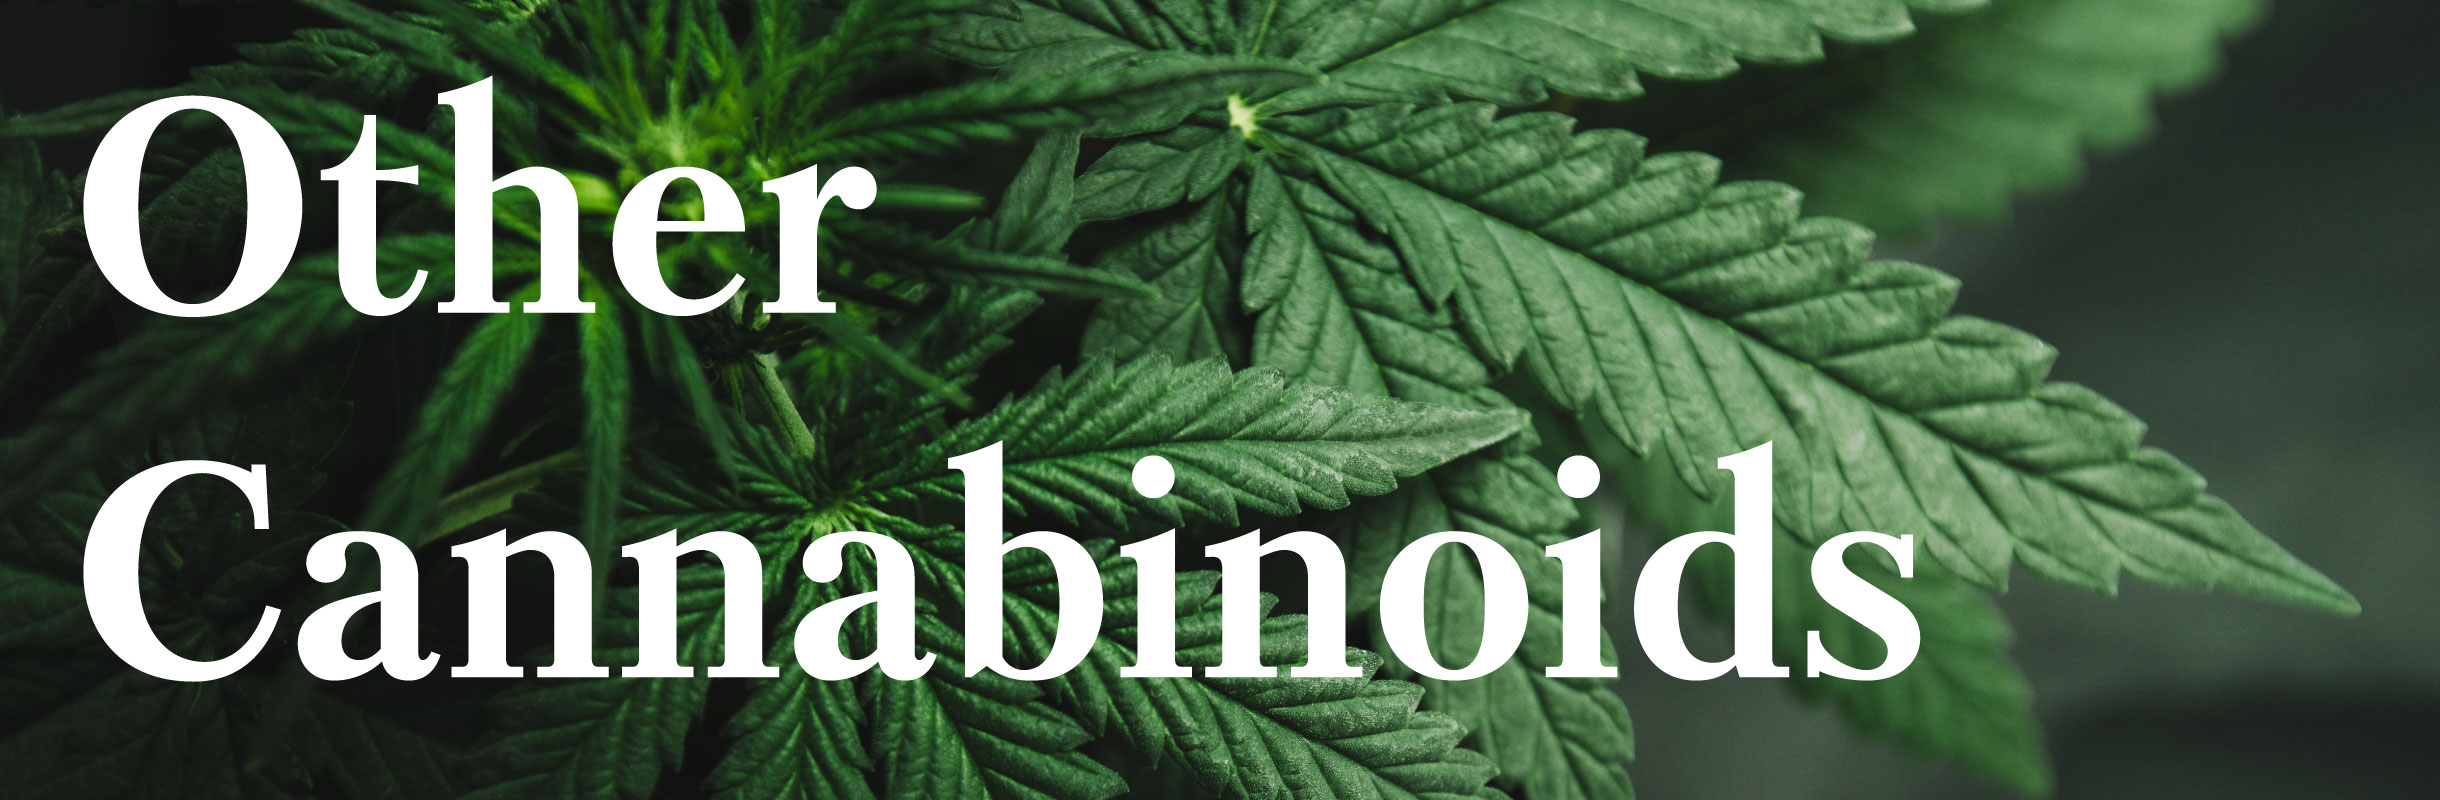 other-cannabinoids-header.jpg